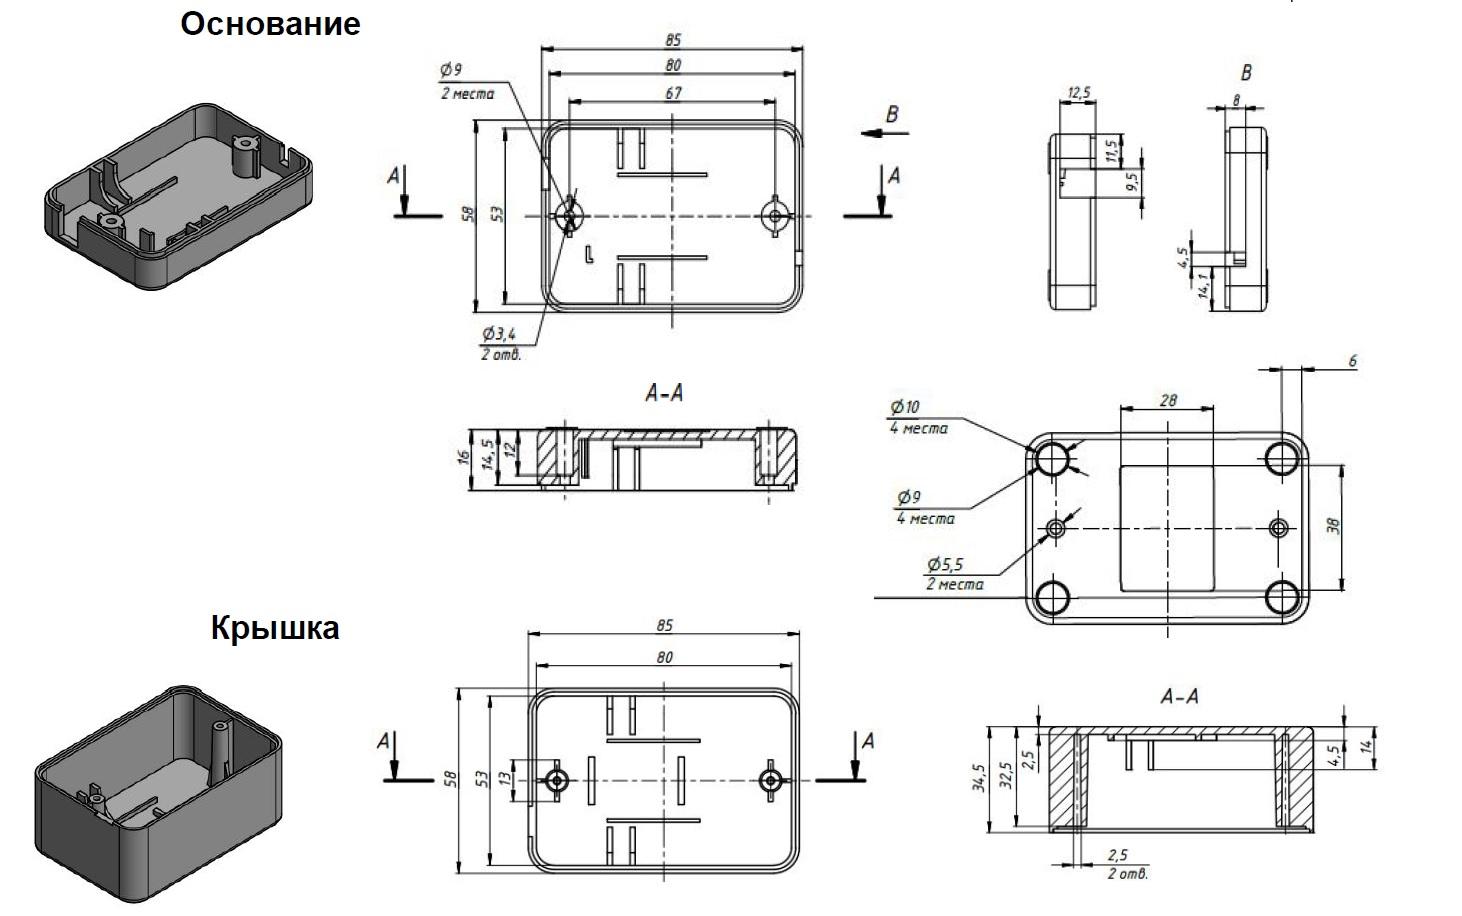 Установочные размеры - BOX-PM1 - Корпус пластиковый белый 85х58х50 мм